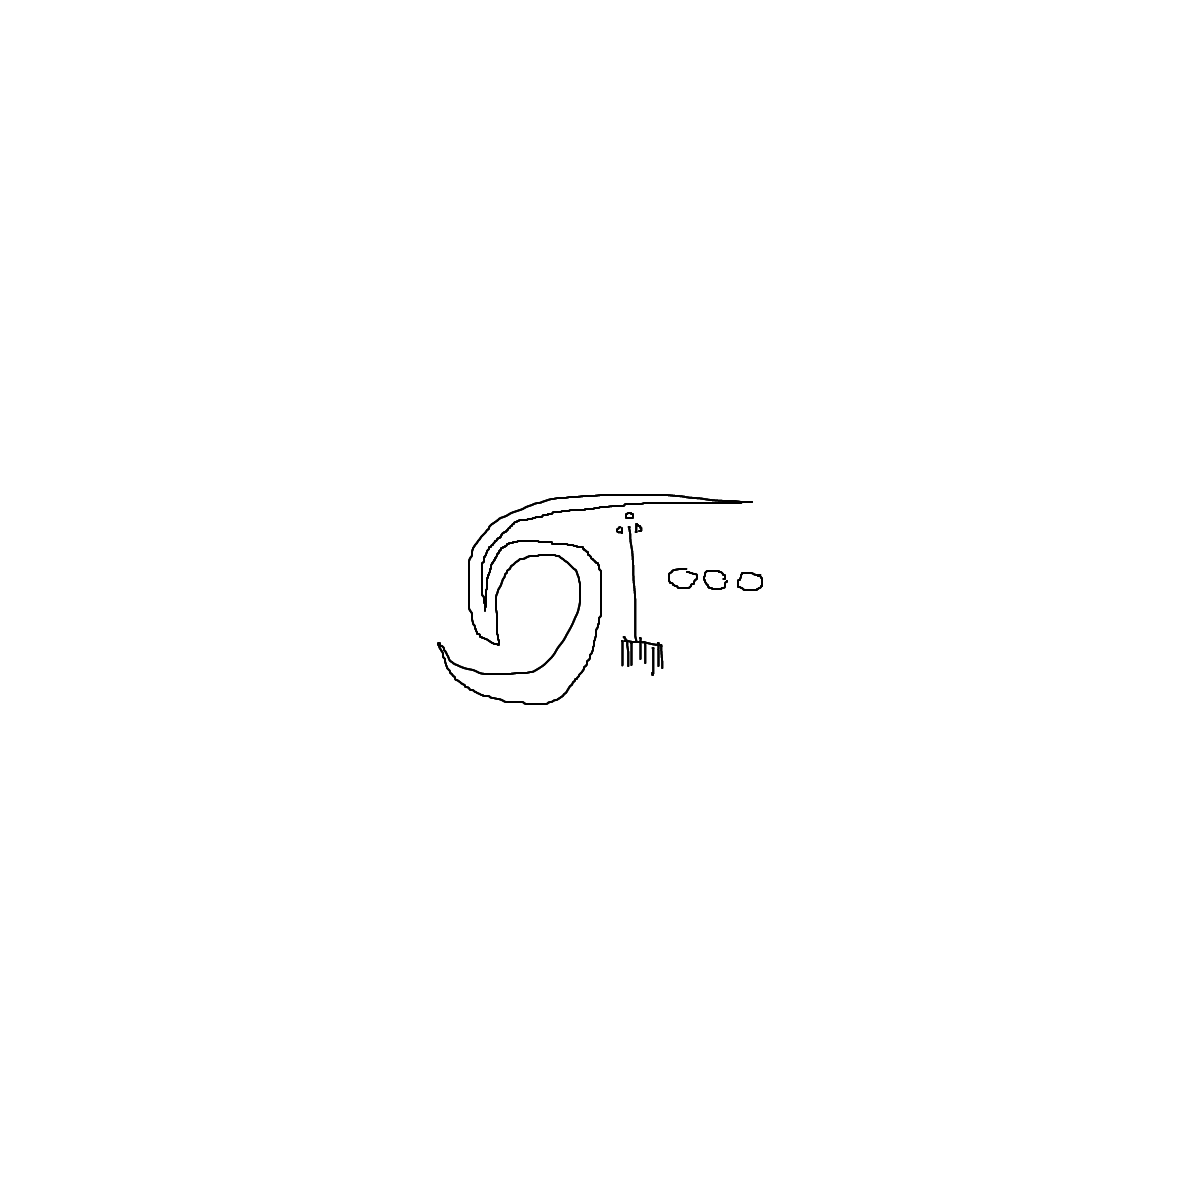 BAAAM drawing#5550 lat:30.4722175598144530lng: -97.6111526489257800